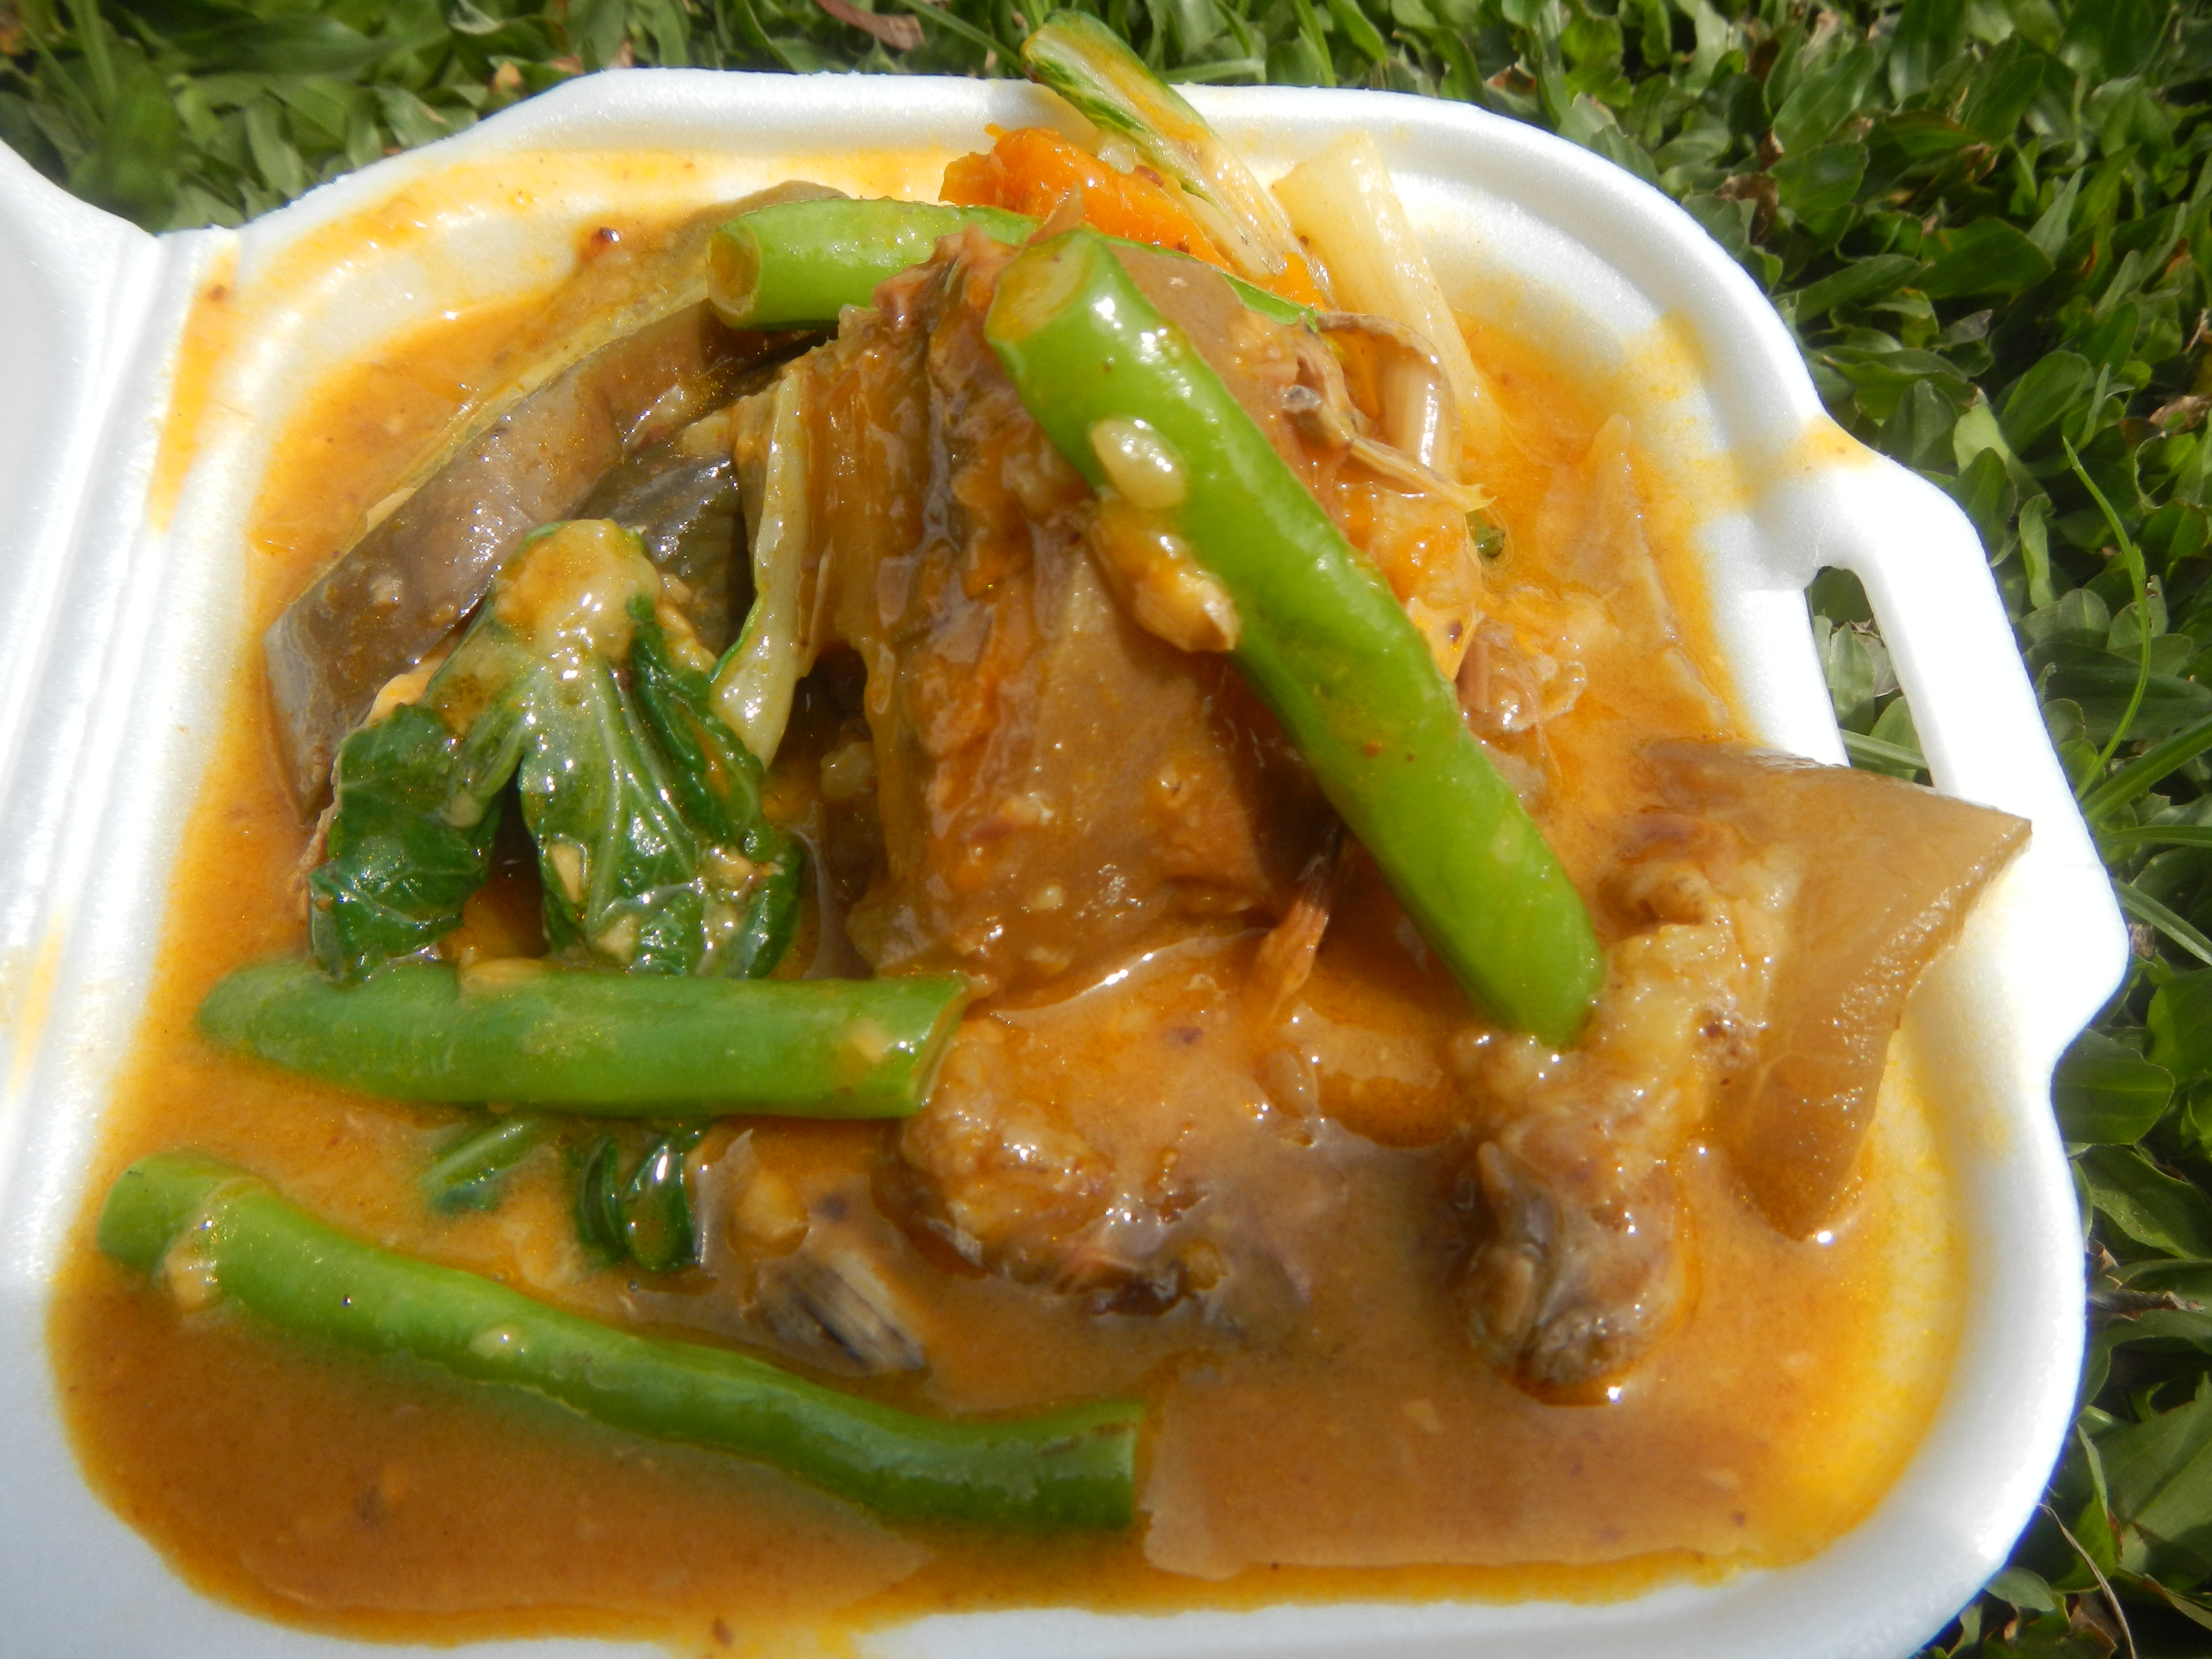 File:06714jfCuisine Foods Kare-kare Kaldereta Bagoong